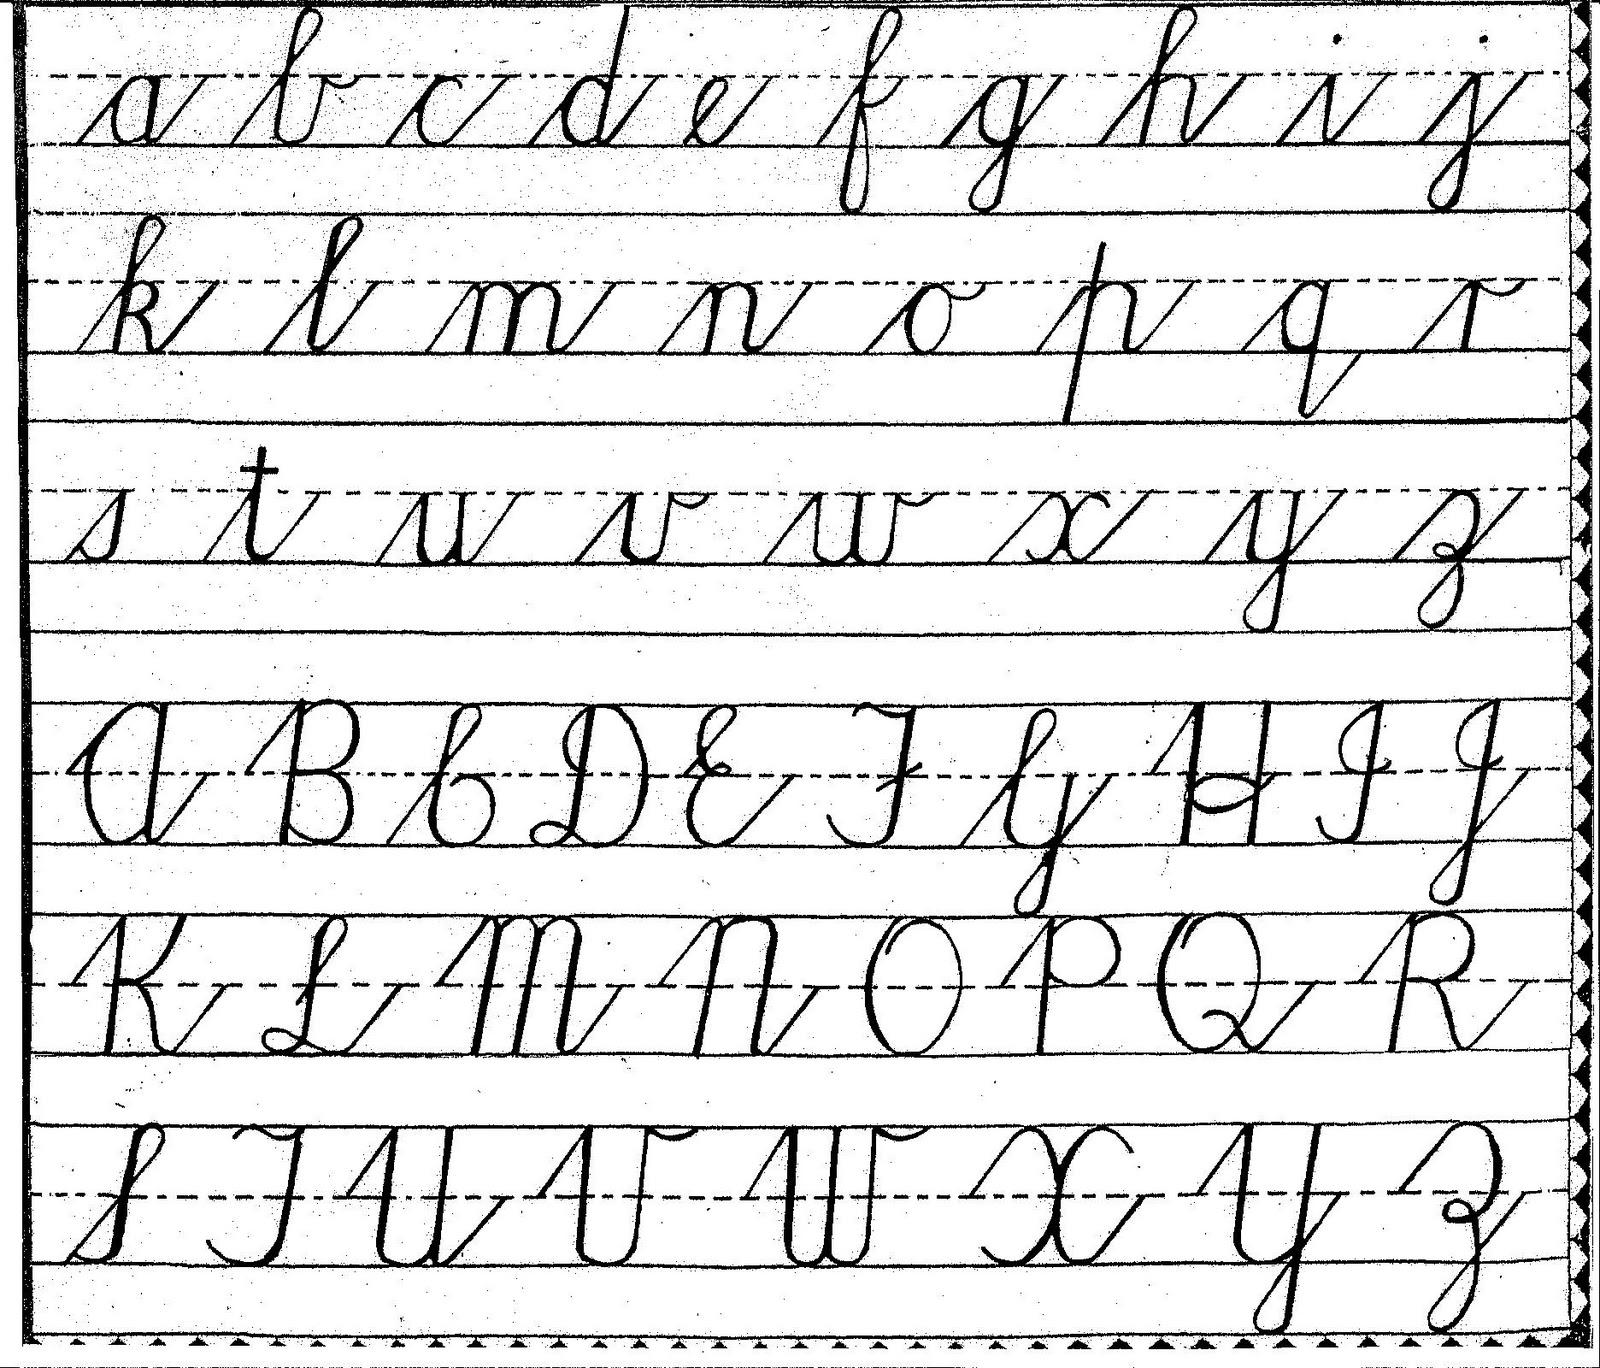 Kidzone Cursive Writing Worksheets Printable And Create regarding Letter T Worksheets Kidzone